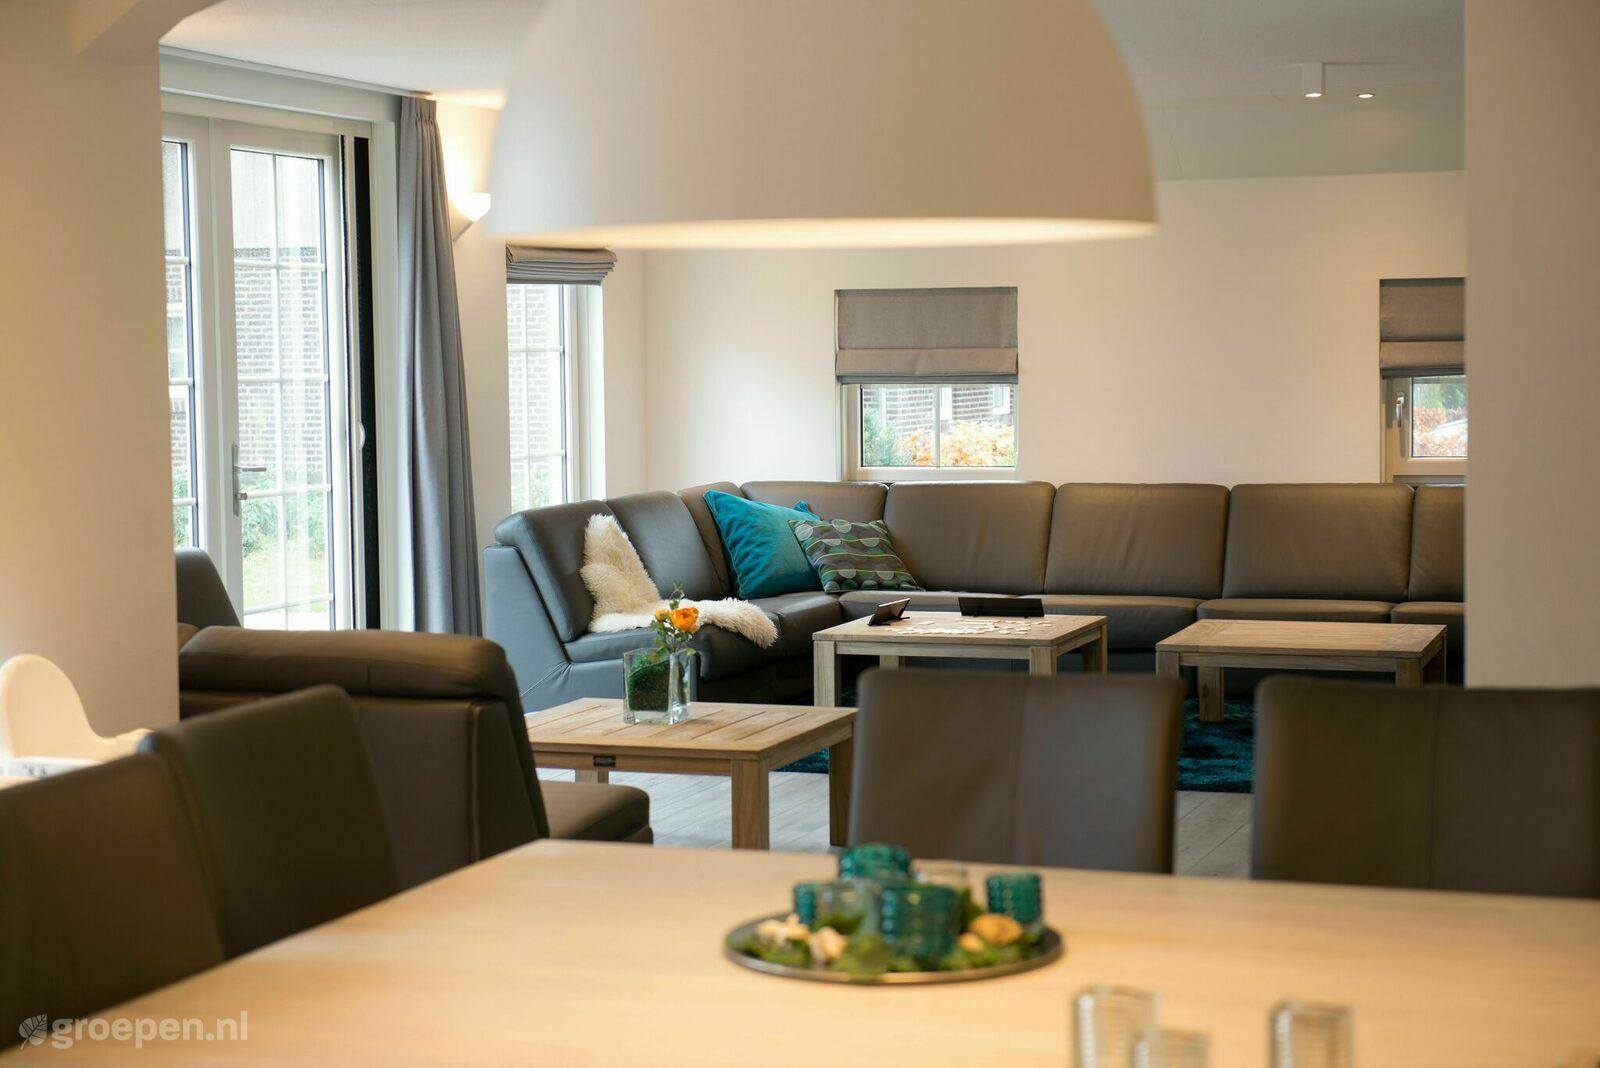 Group accommodation Hellendoorn